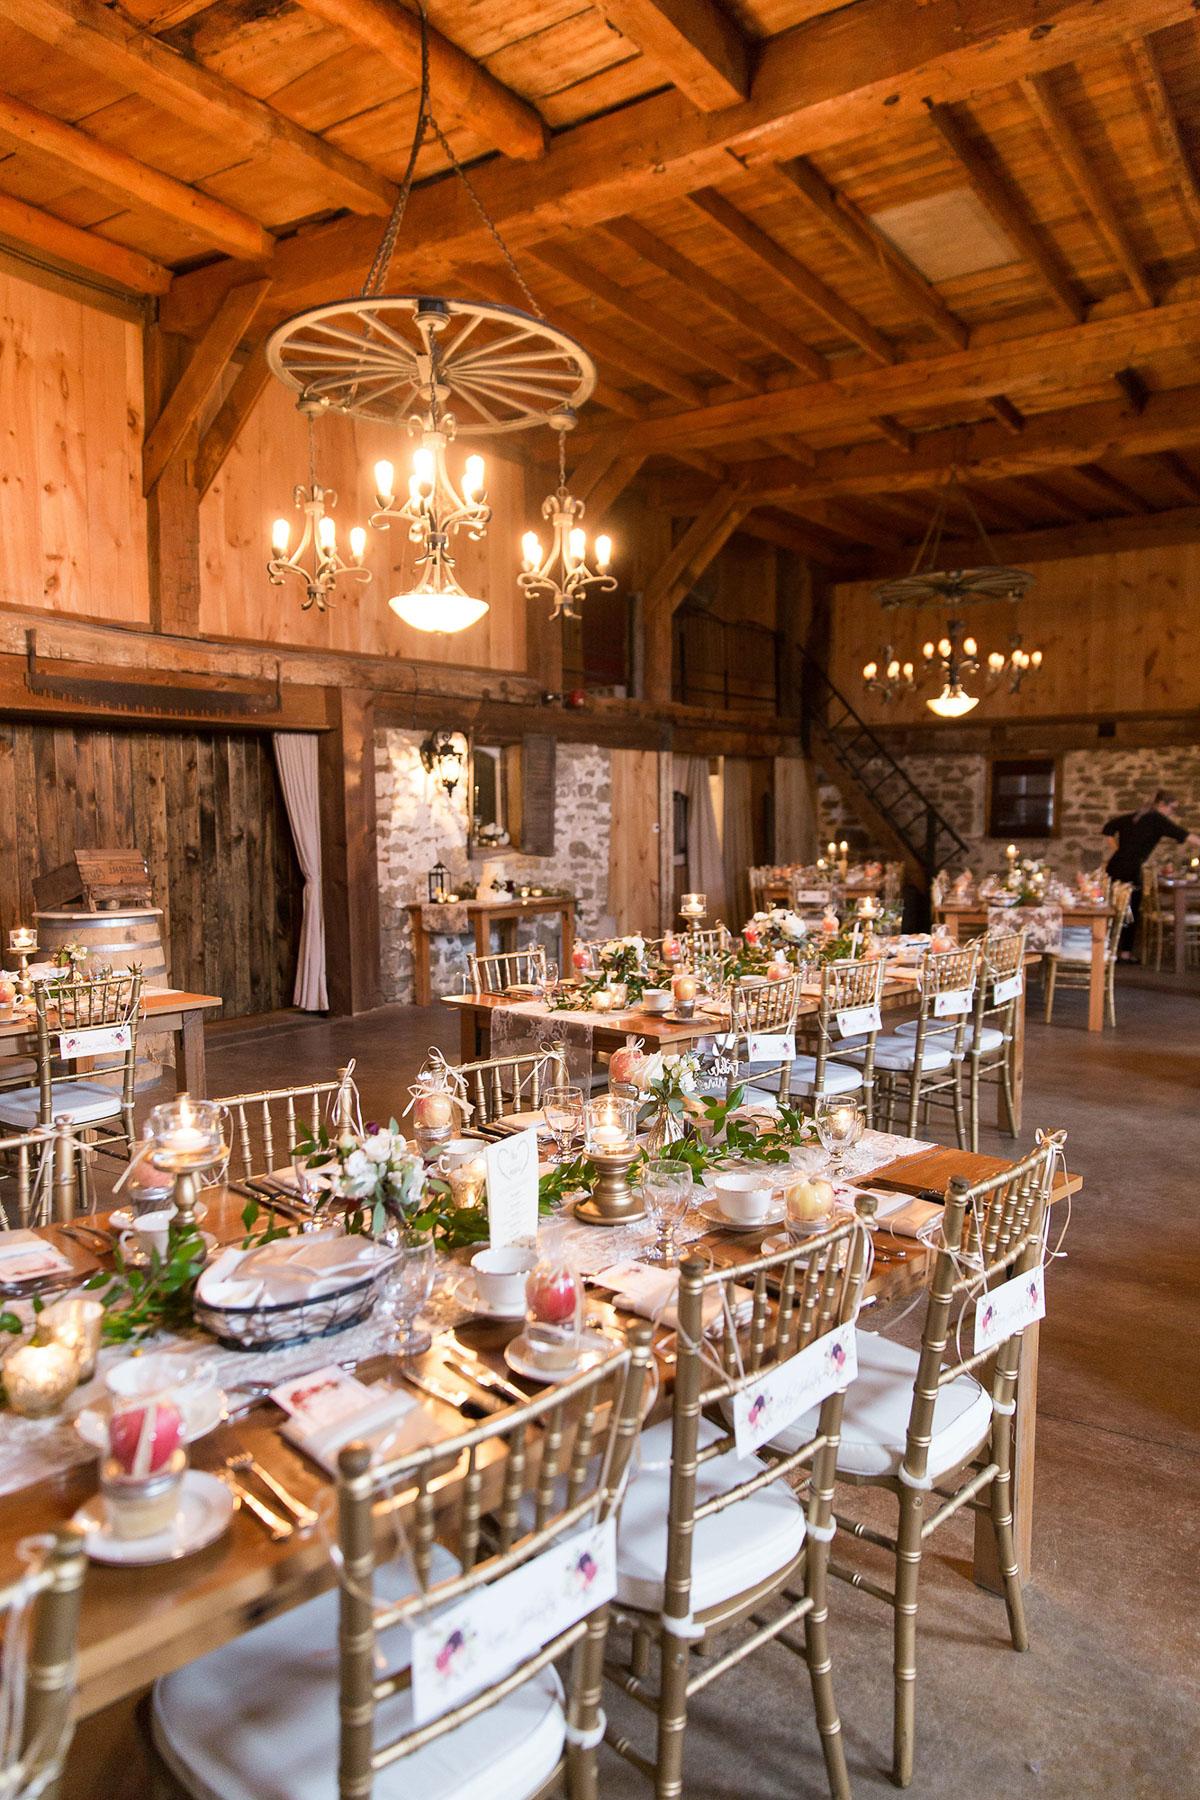 gemini-photography-vineyard-bride-swish-list-honsberger-estates-jordan-wedding-3.jpg